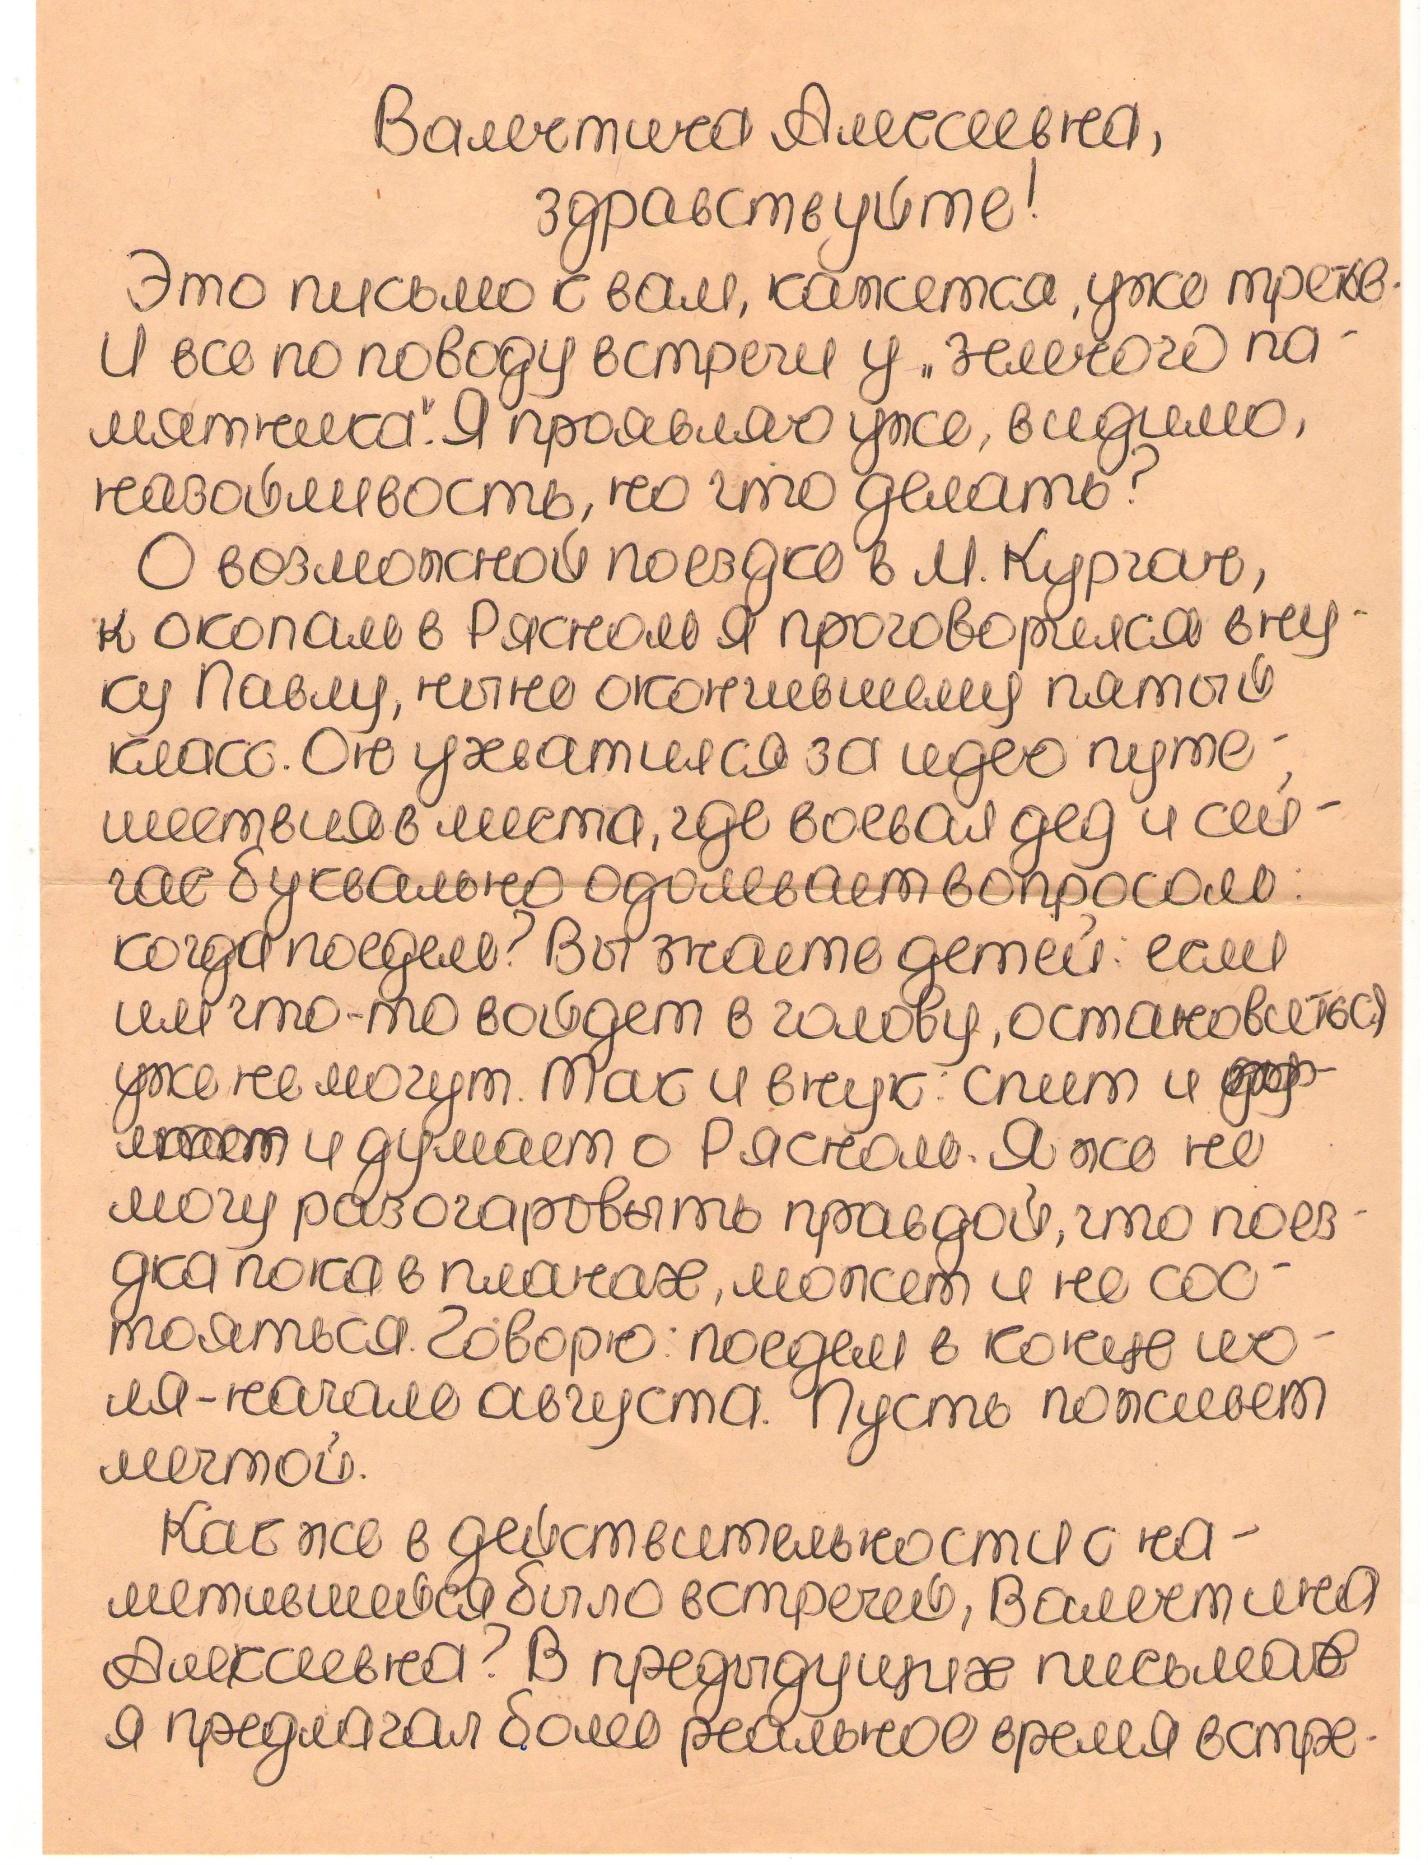 C:\Documents and Settings\СоцПед\Рабочий стол\2013-11-18\21.06.1988\Изображение0005.JPG